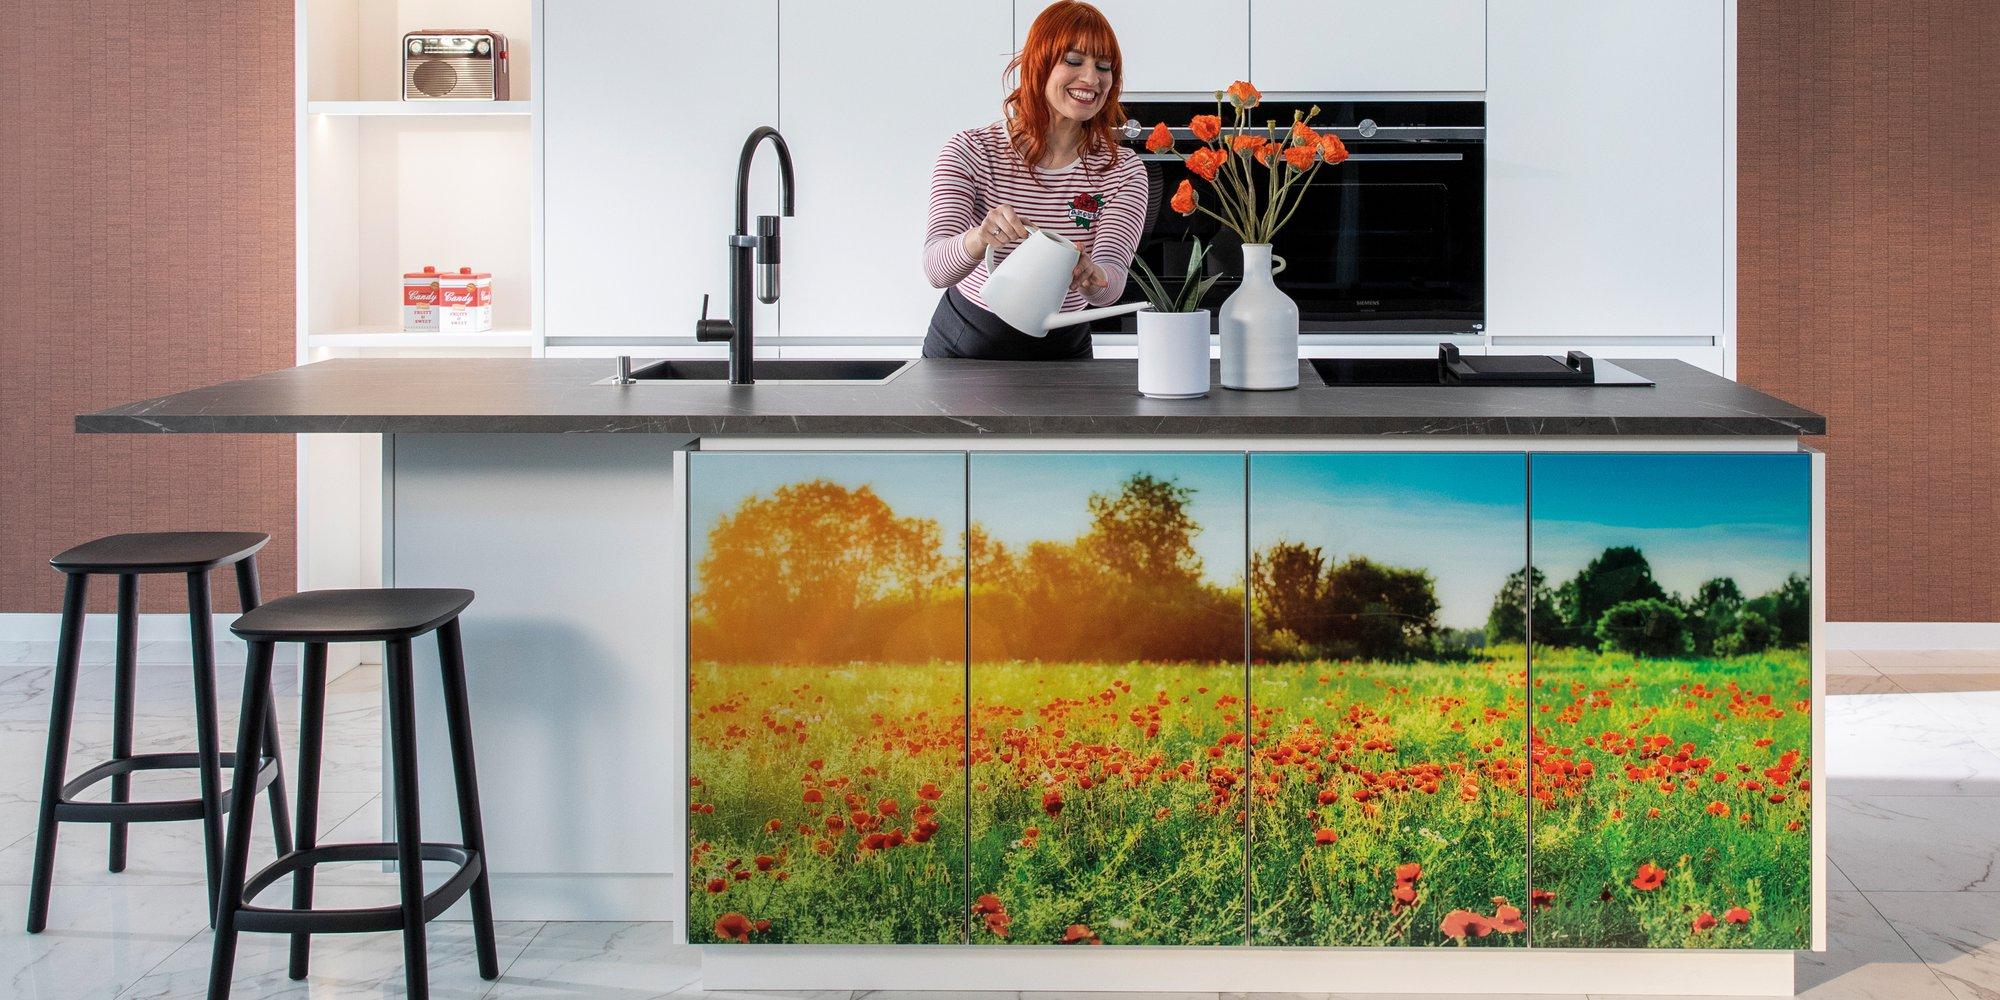 Personaliseer je keuken met je favoriete foto